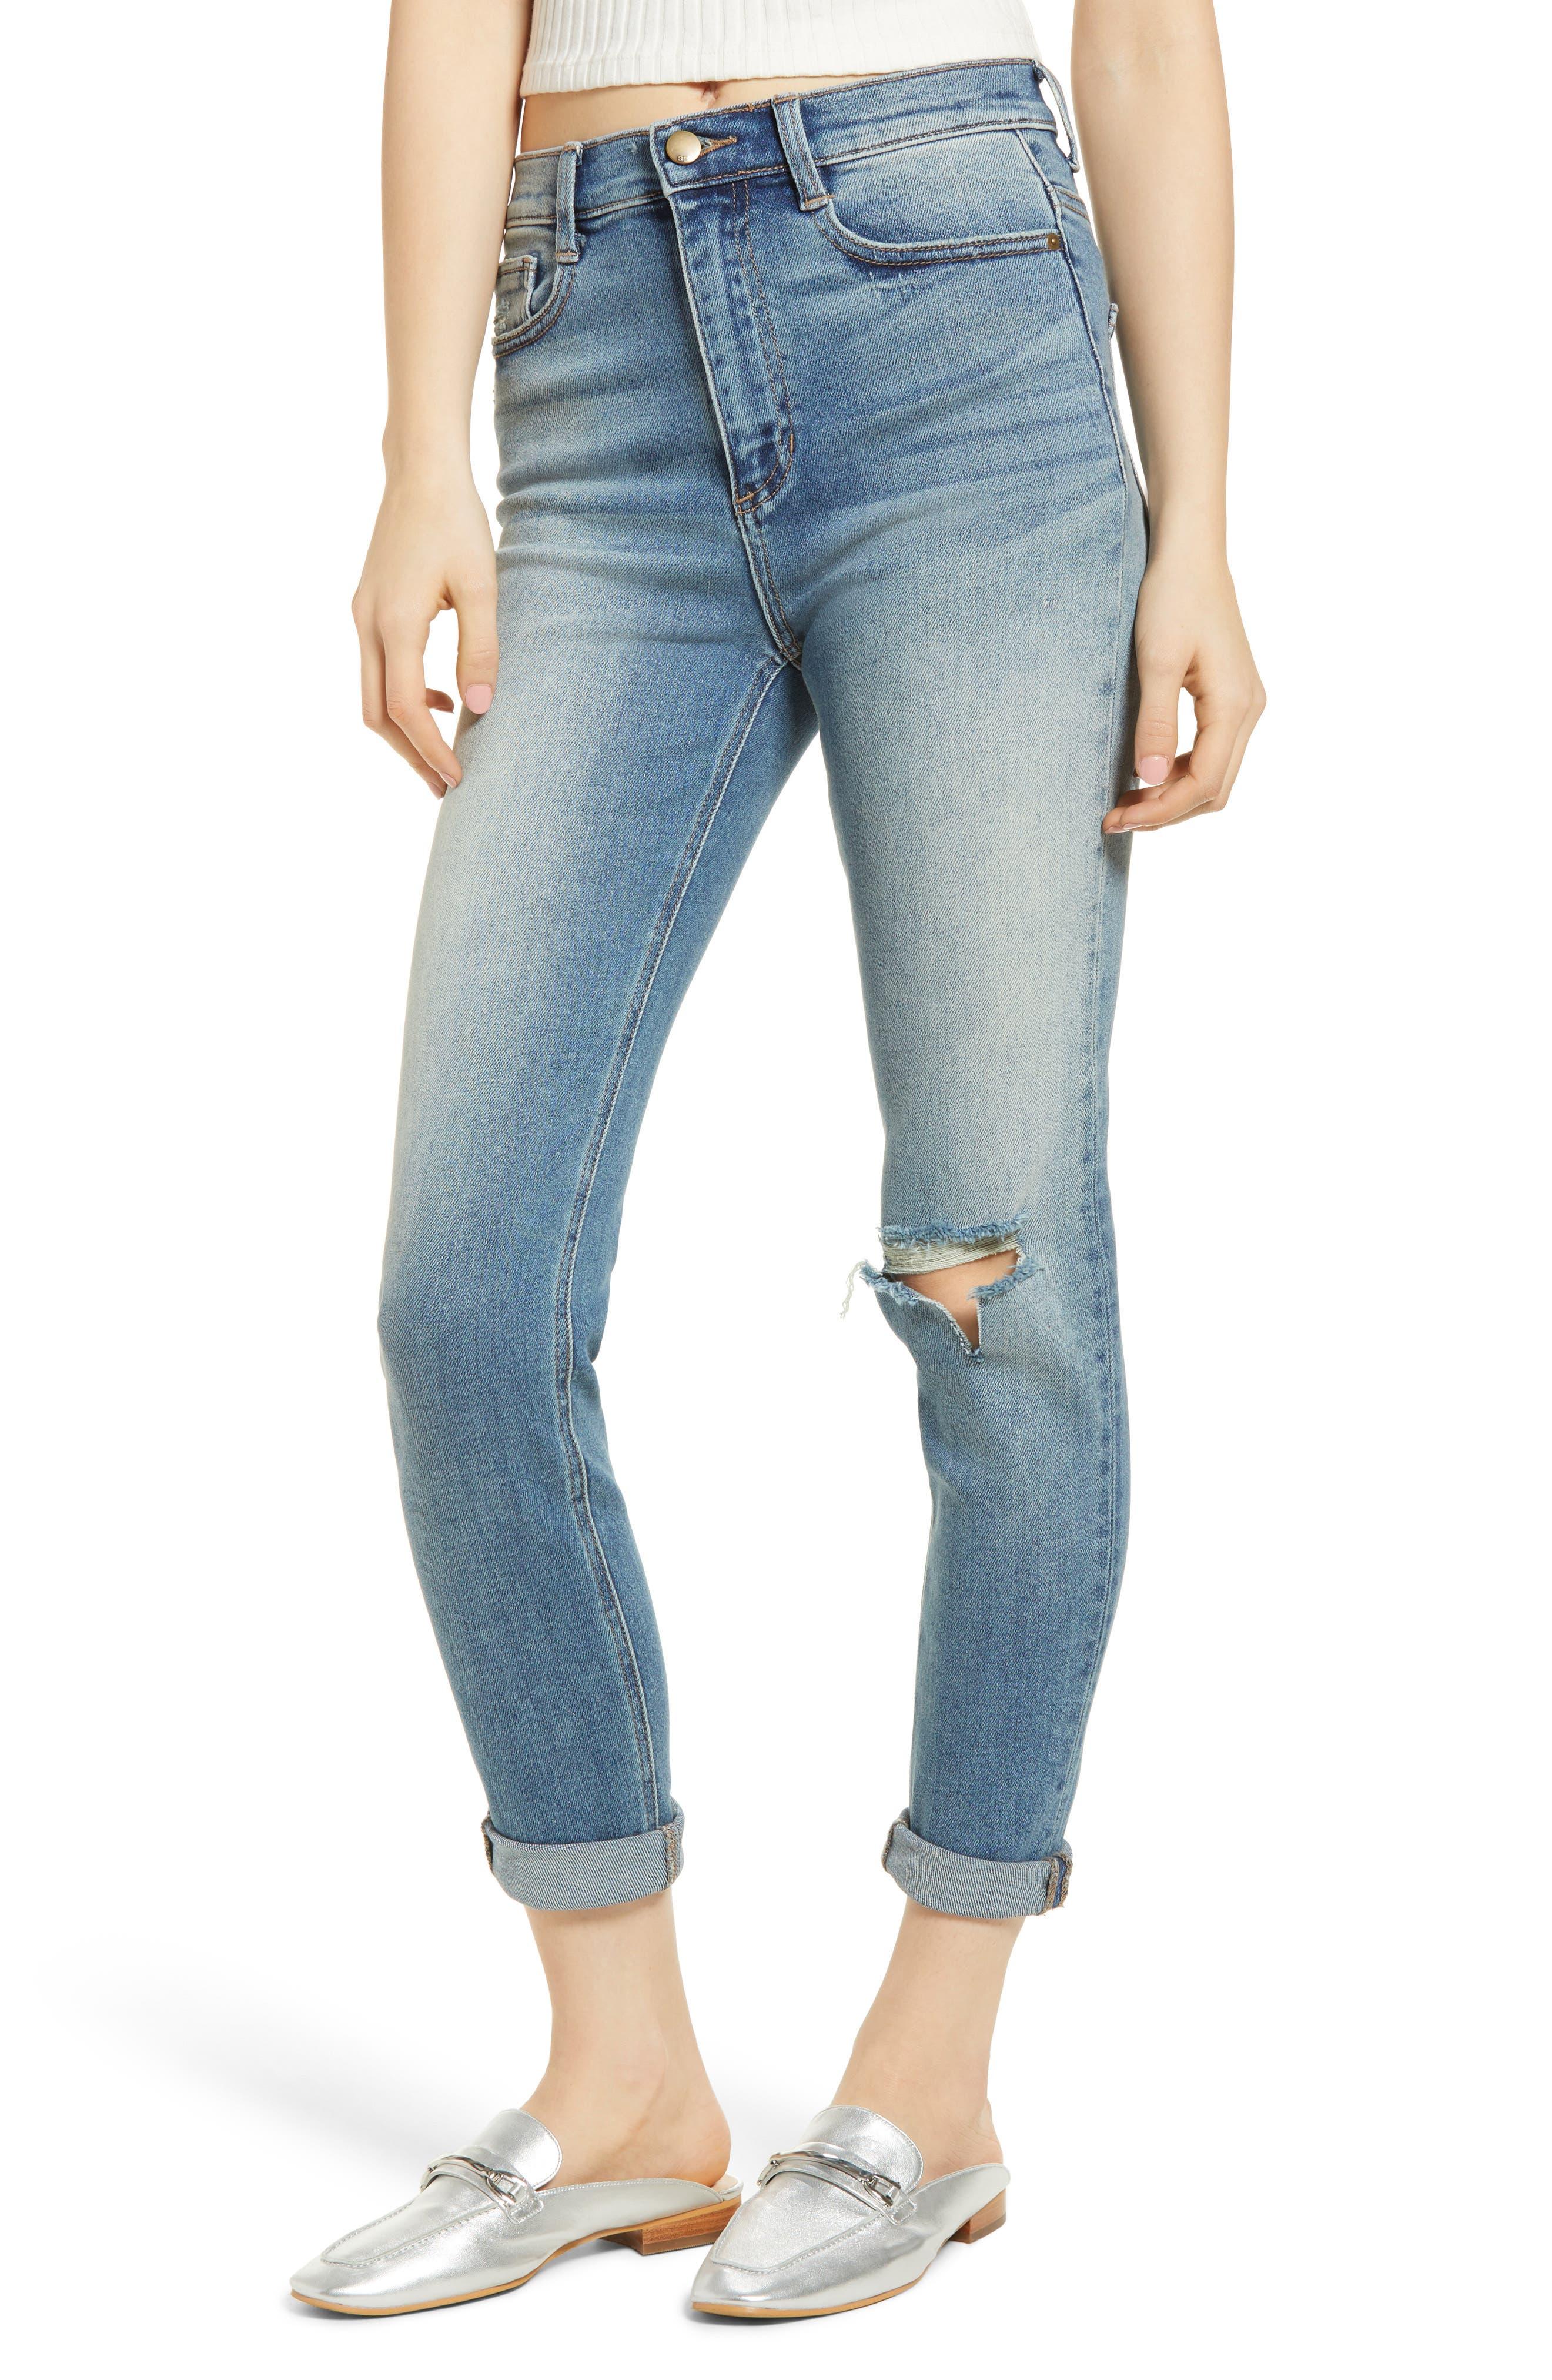 SP Black Ripped High Waist Boyfriend Jeans